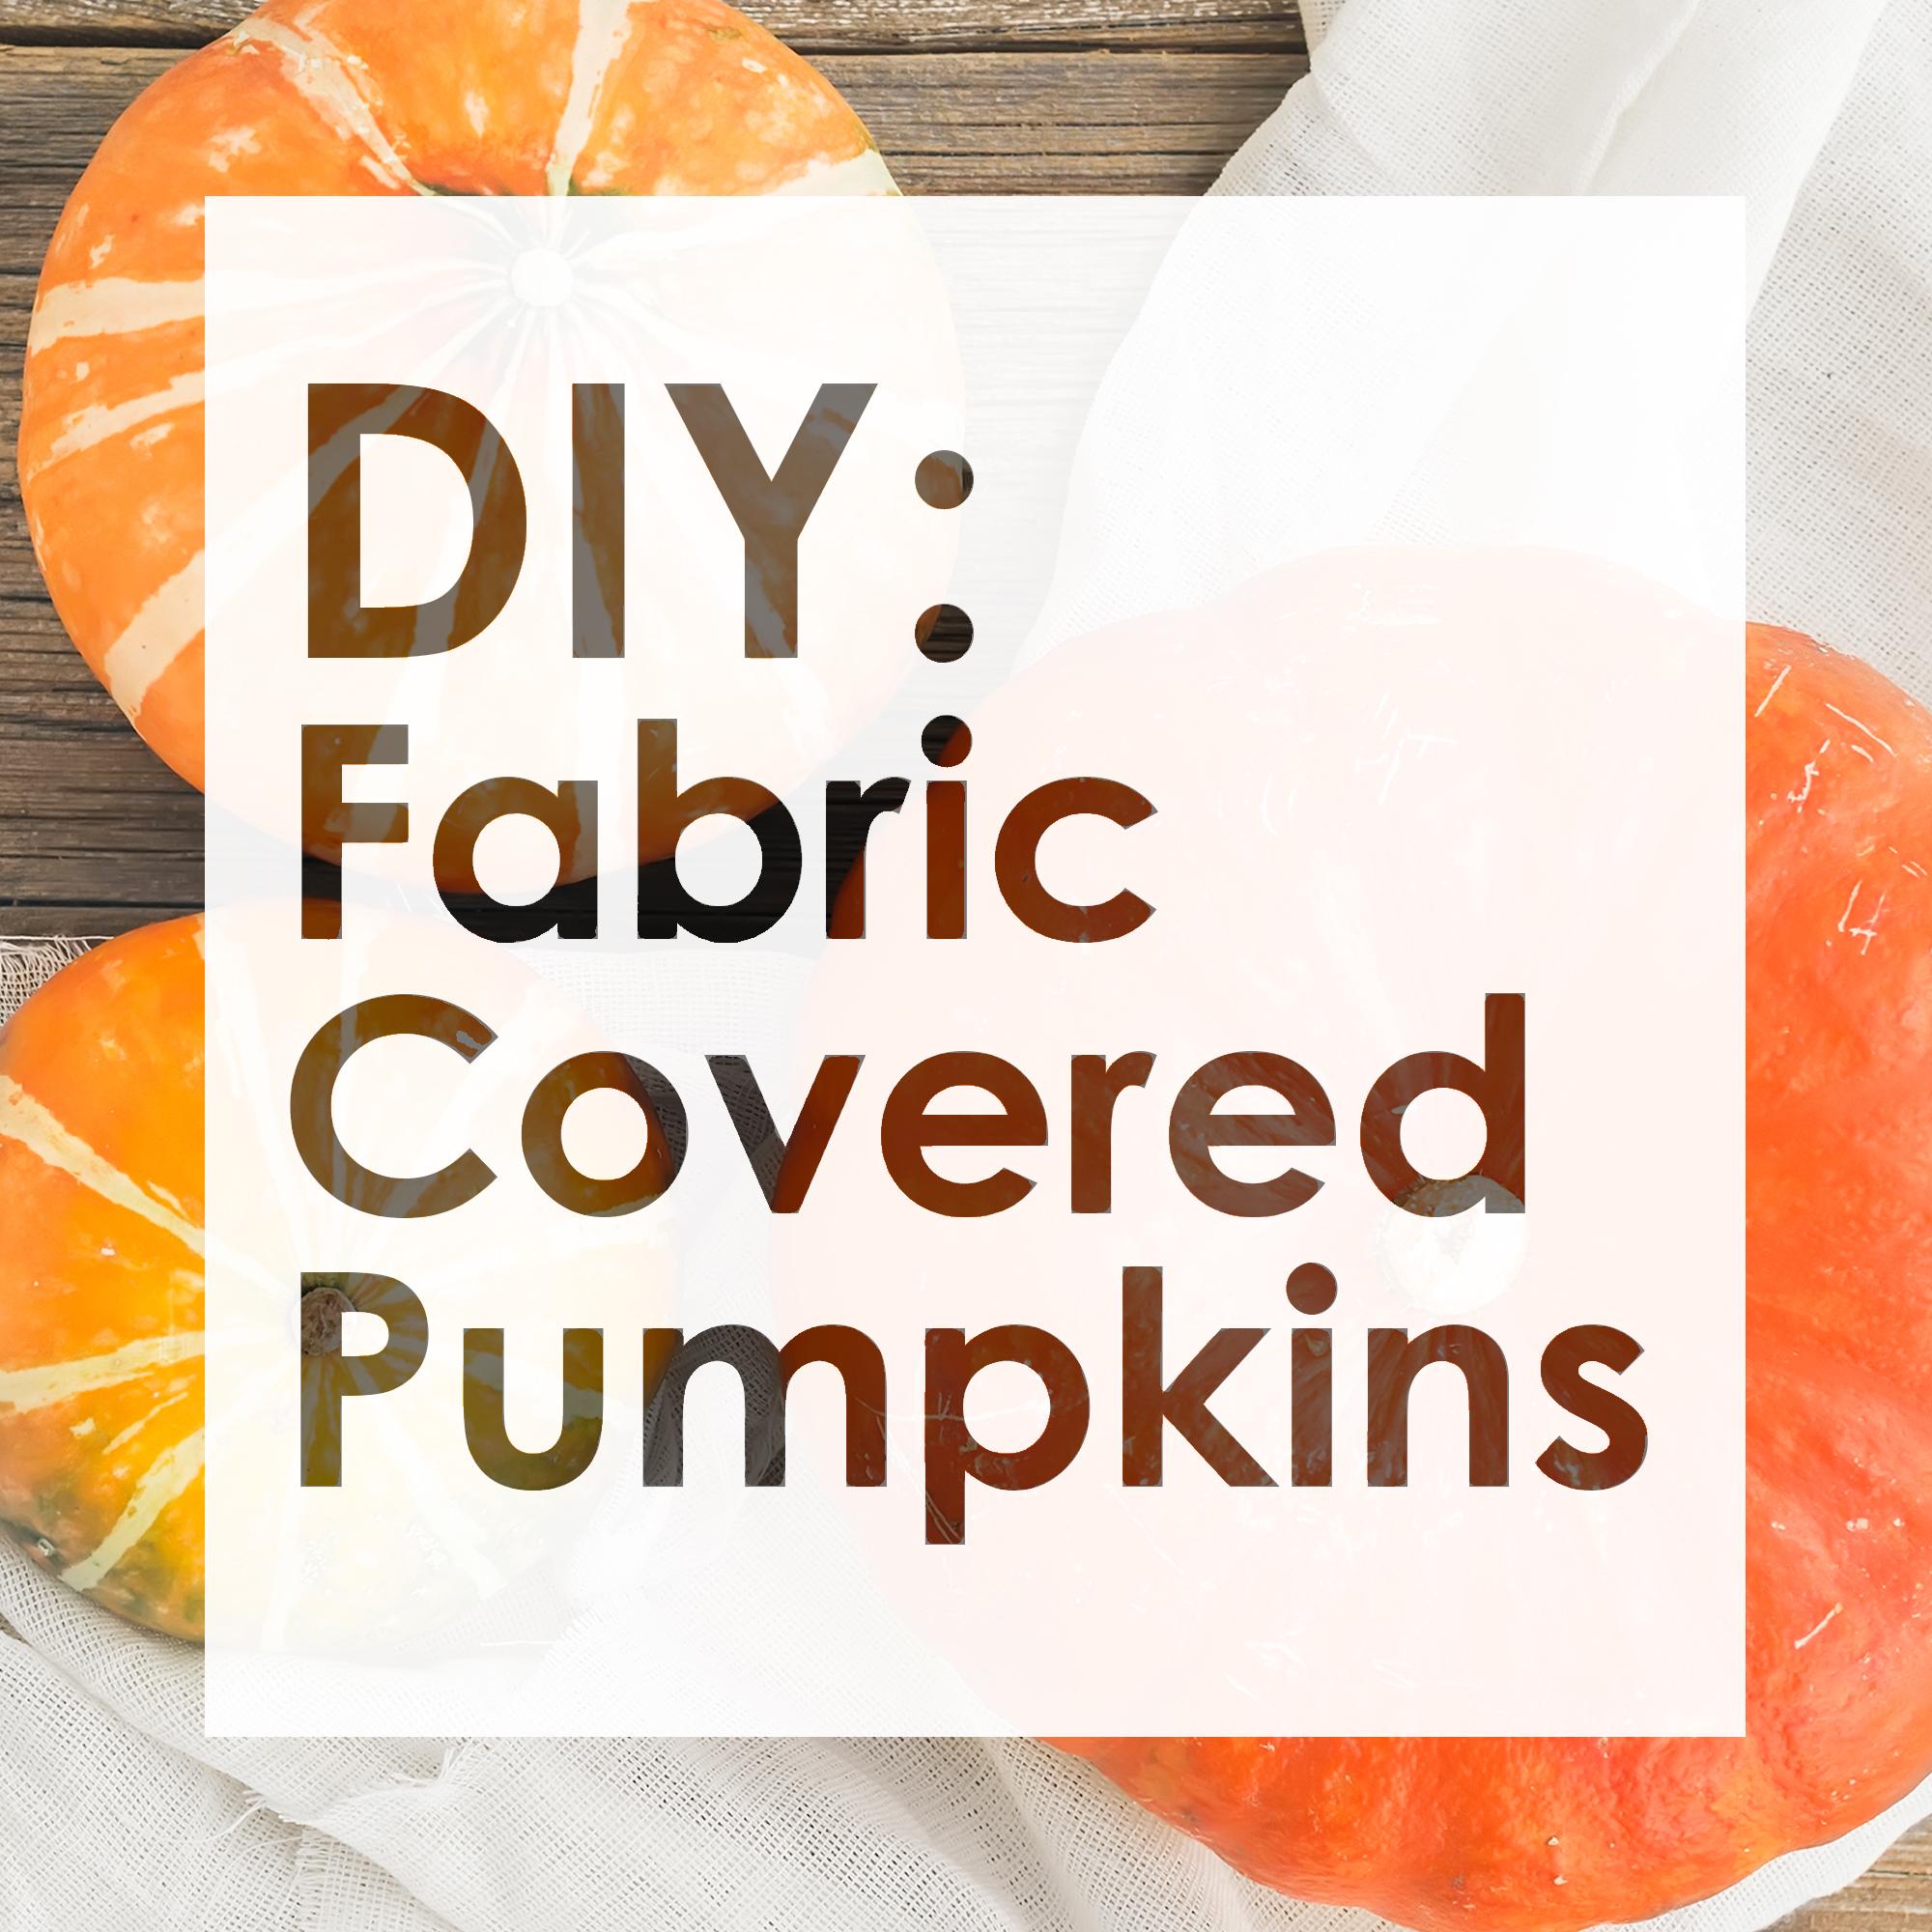 DIY: Fabric Covered Pumpkins